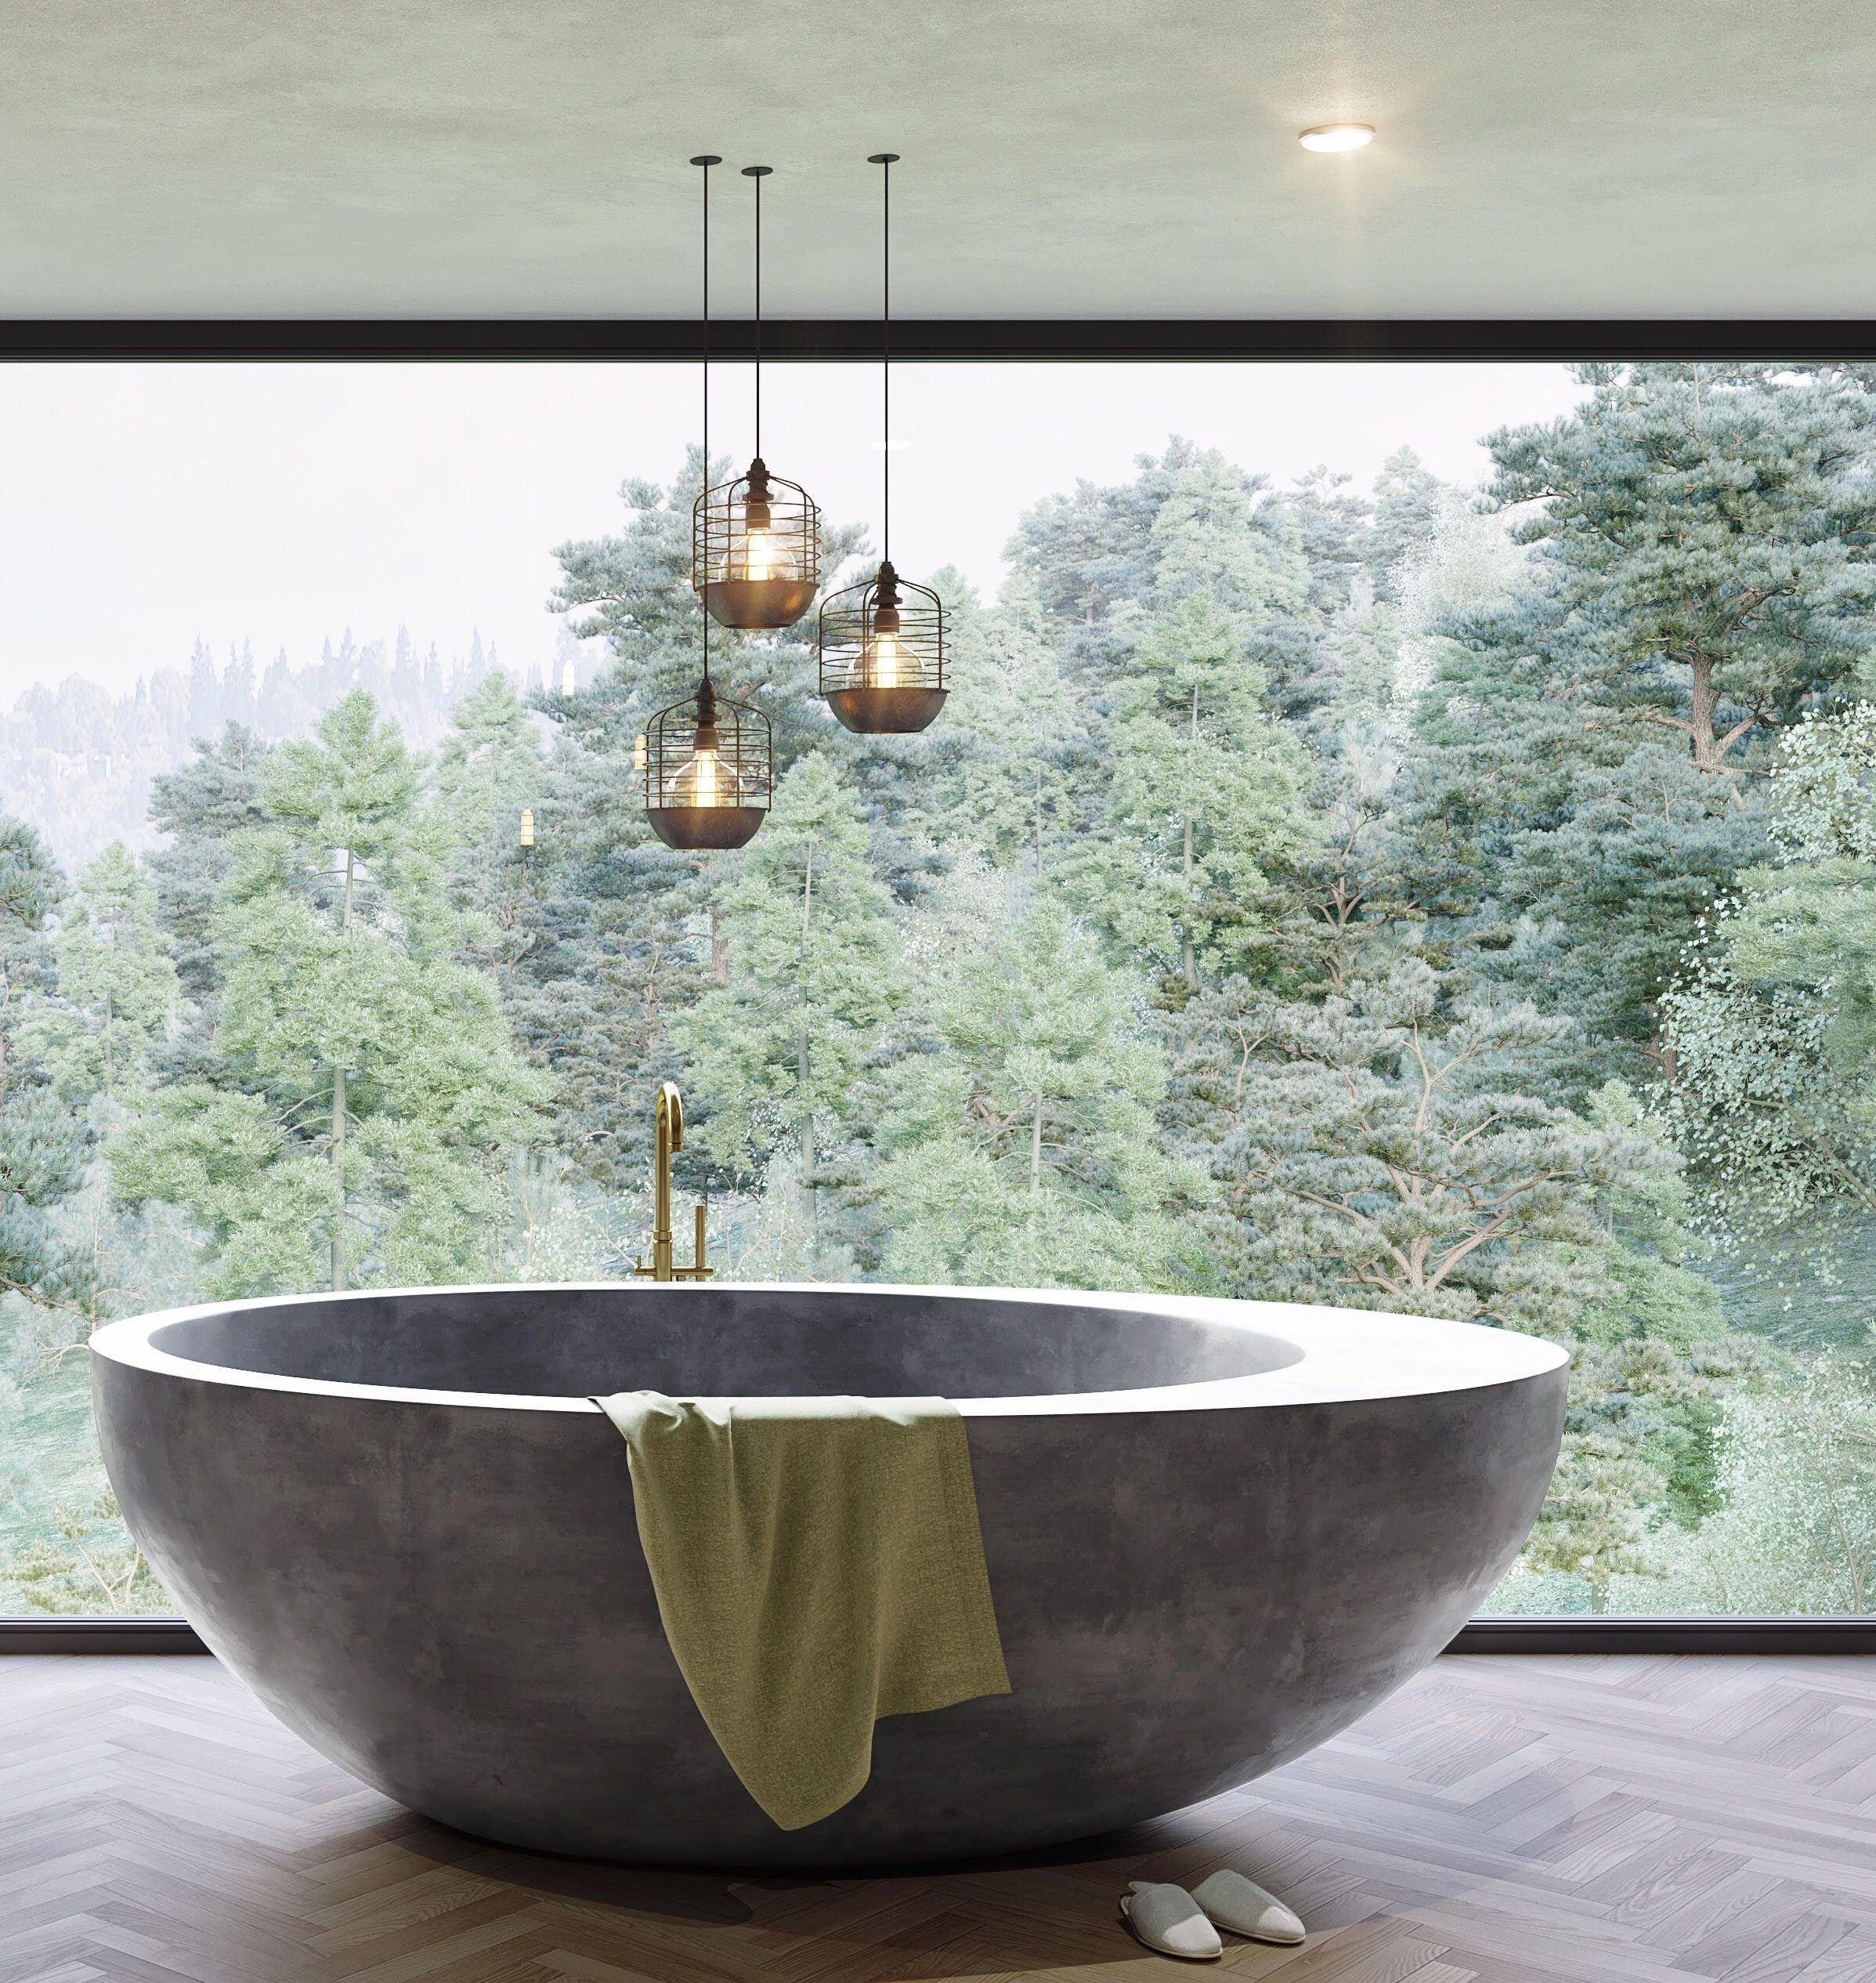 INTRA Concrete Bath - by Meek Bathware. Australian made & designed ...